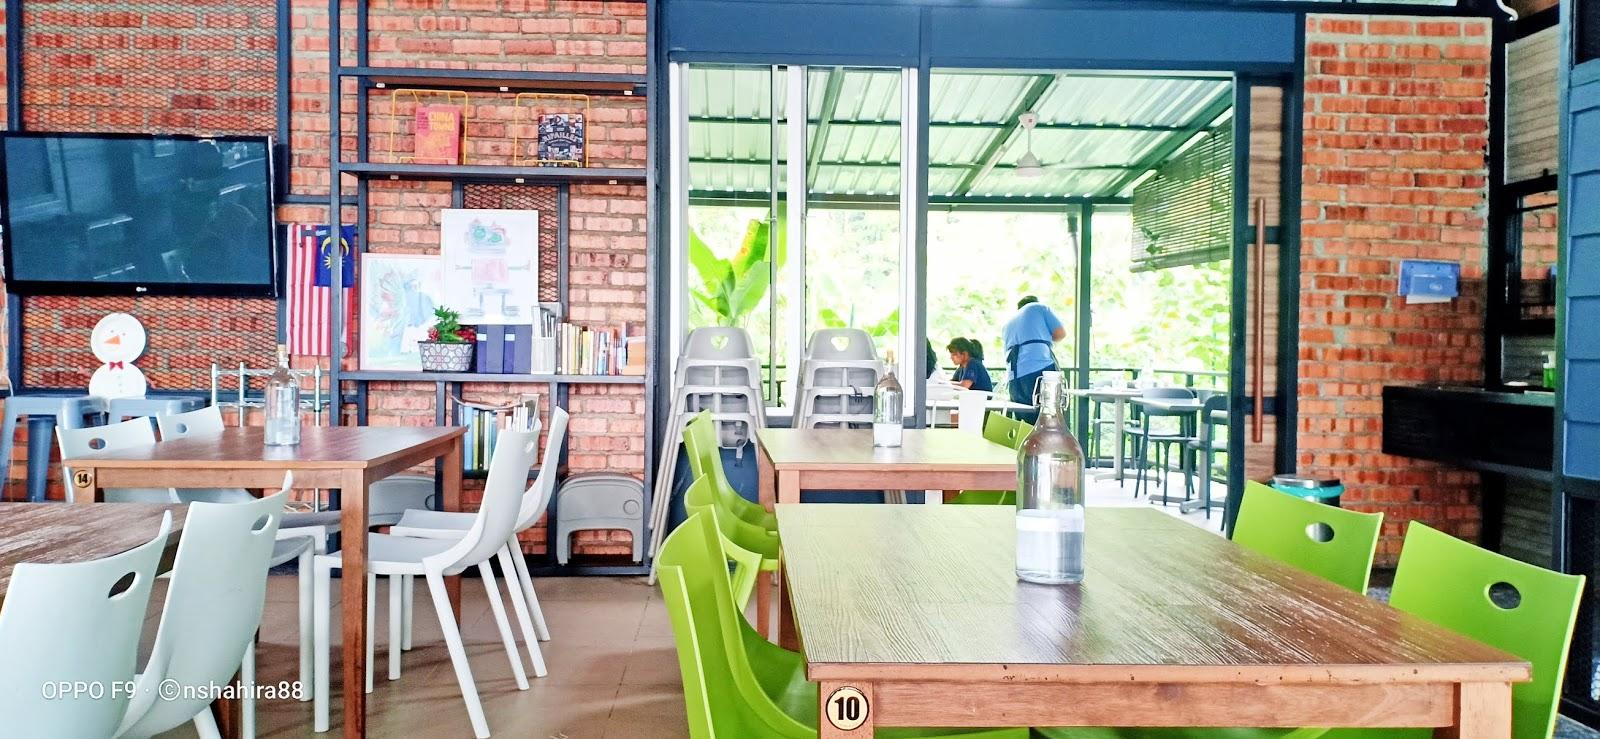 Lunch di HayYan HuDa Opah's Kitchen, Bukit Temiang Seremban